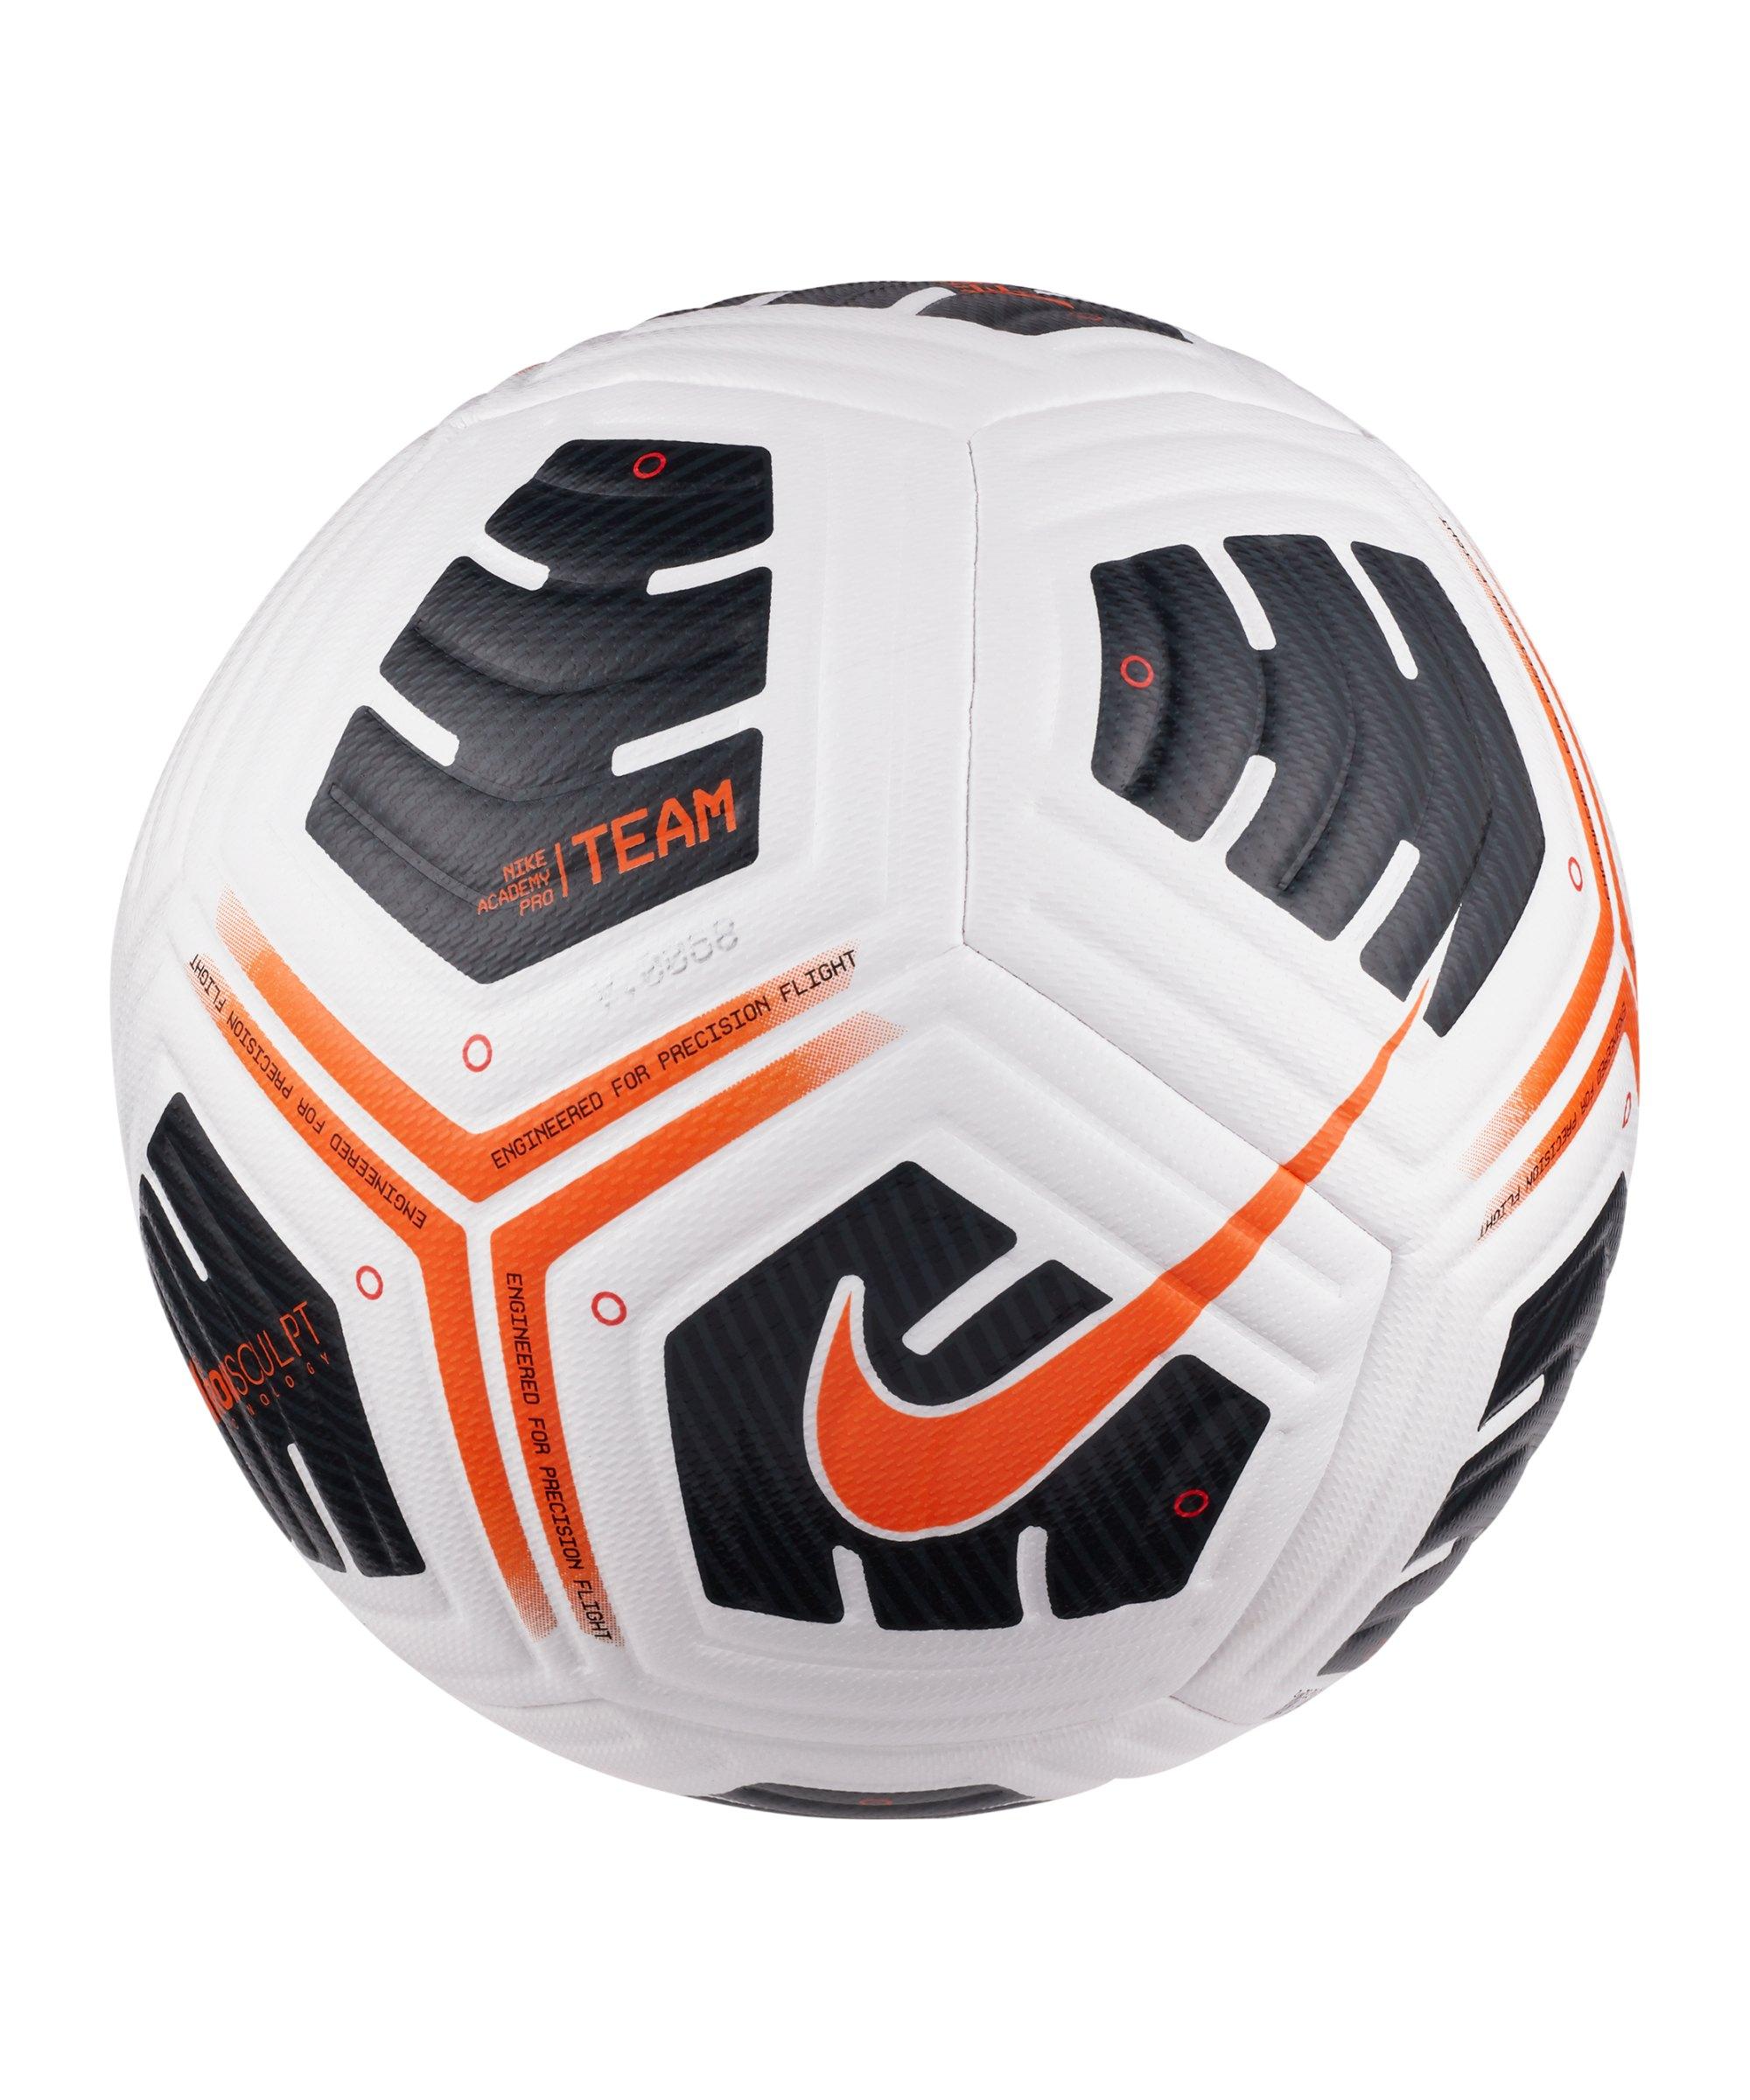 Nike Academy Pro Team Trainingsball Weiss F101 - weiss